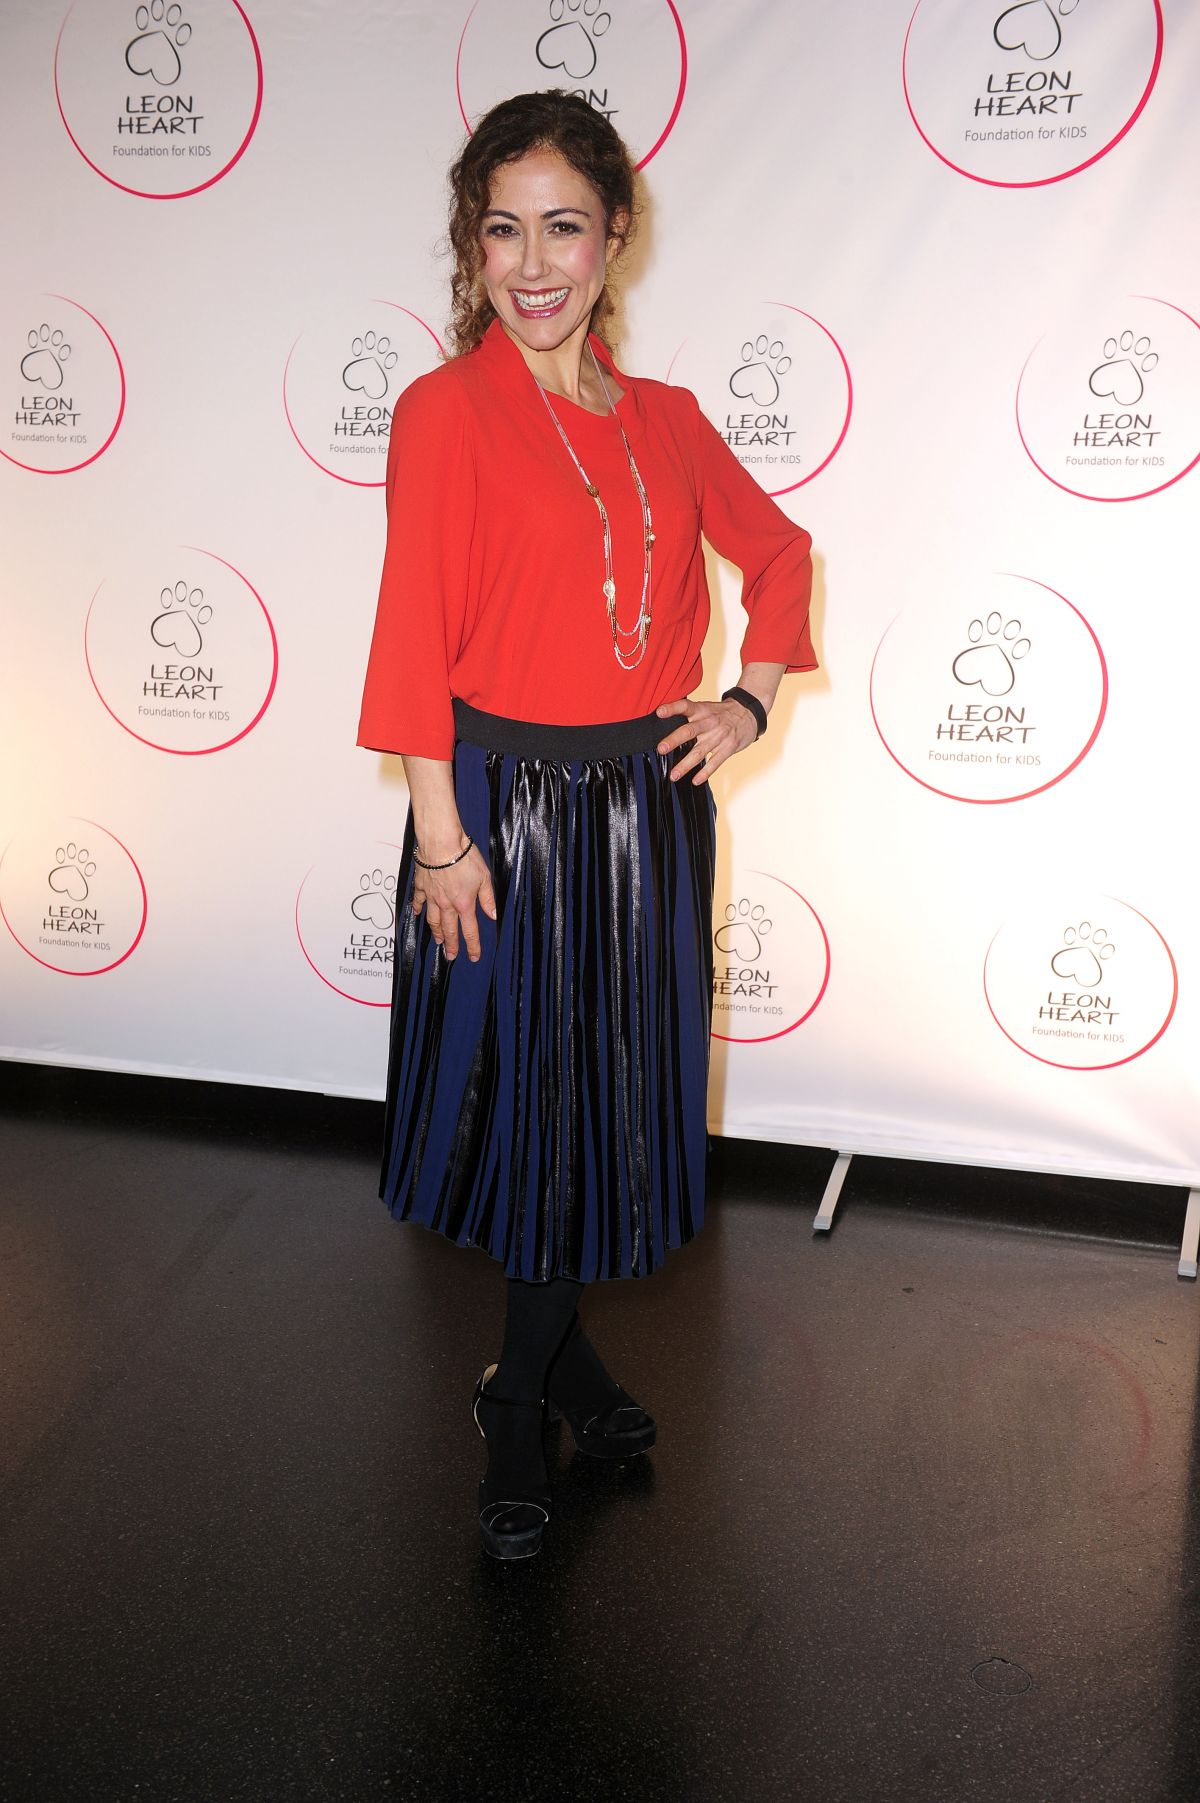 ANASTASIA ZAMPOUNIDIS at Leon Heart Foundation Charity Dinner in Berlin 10/28/2016